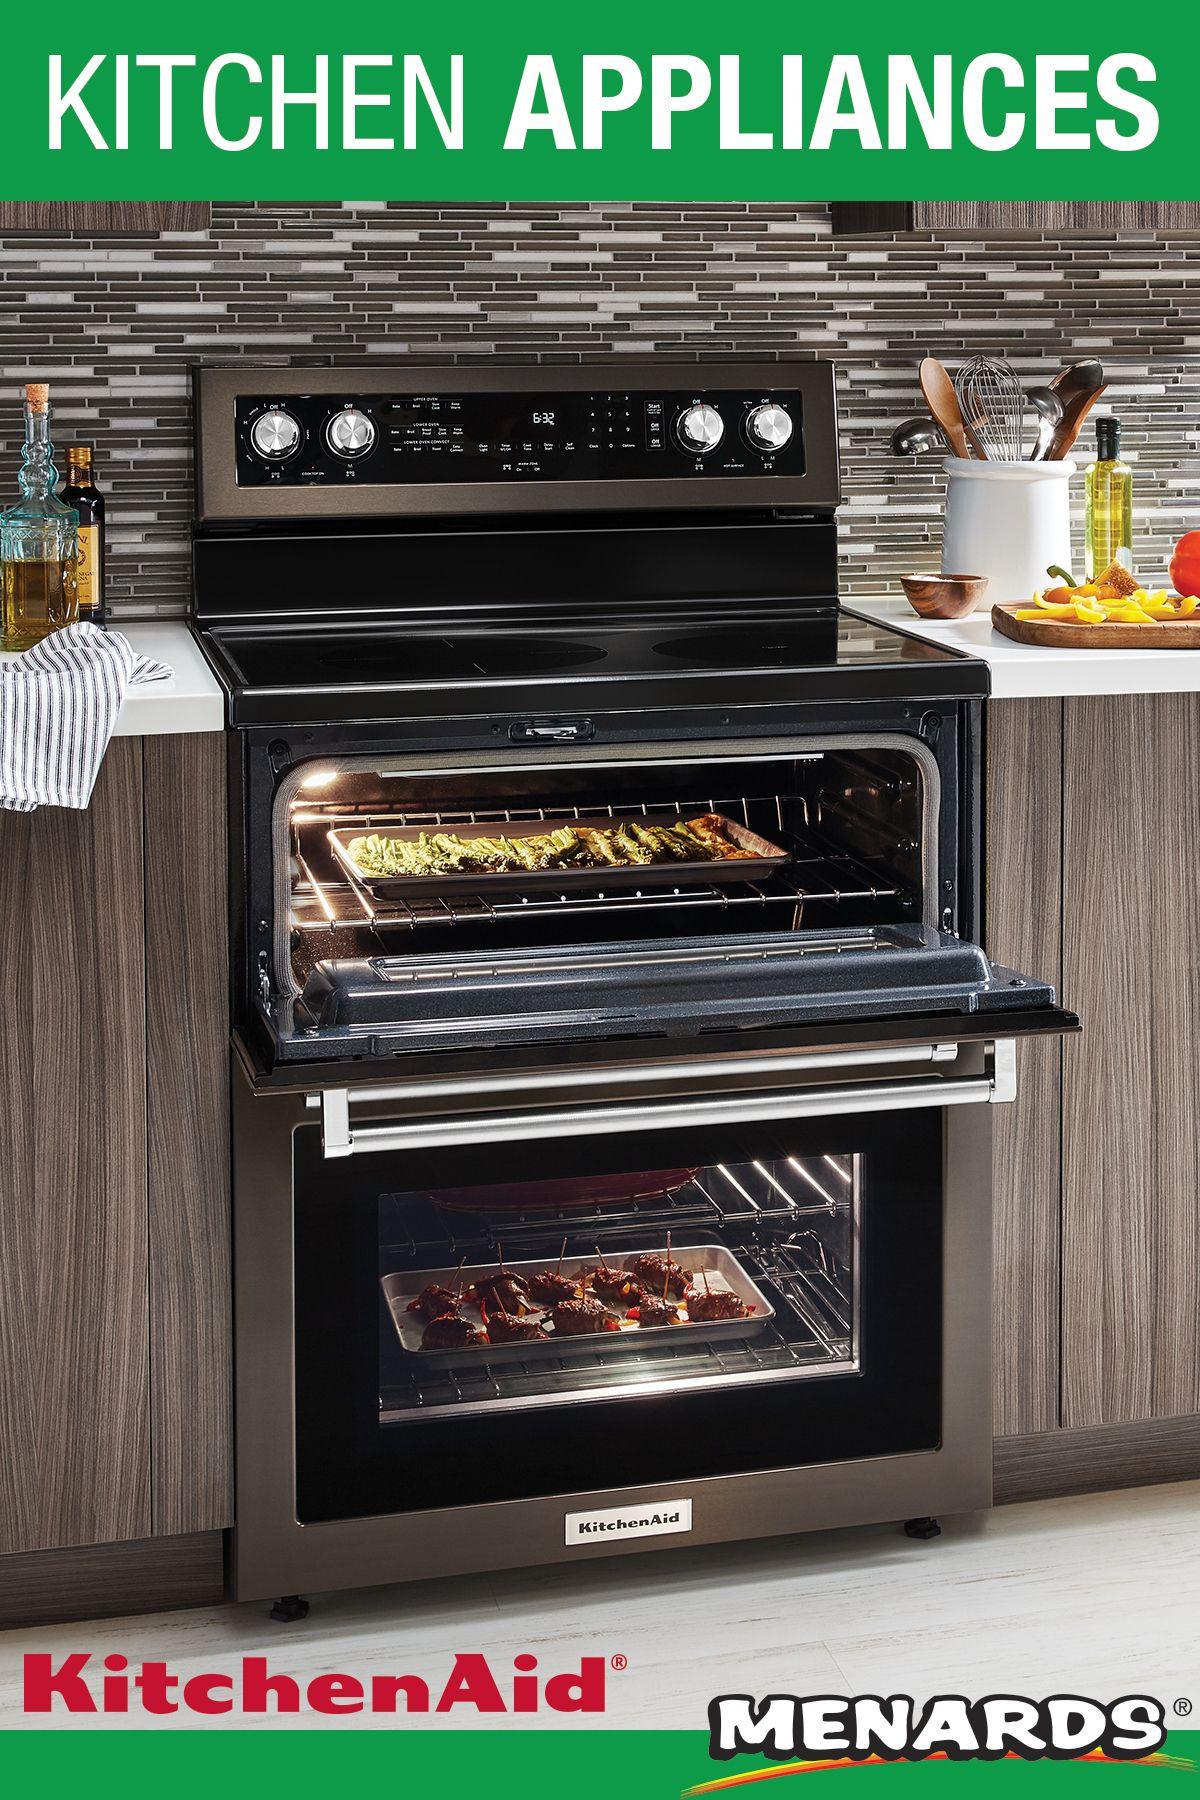 Kitchenaid 30 black stainless steel electric smoothtop 6